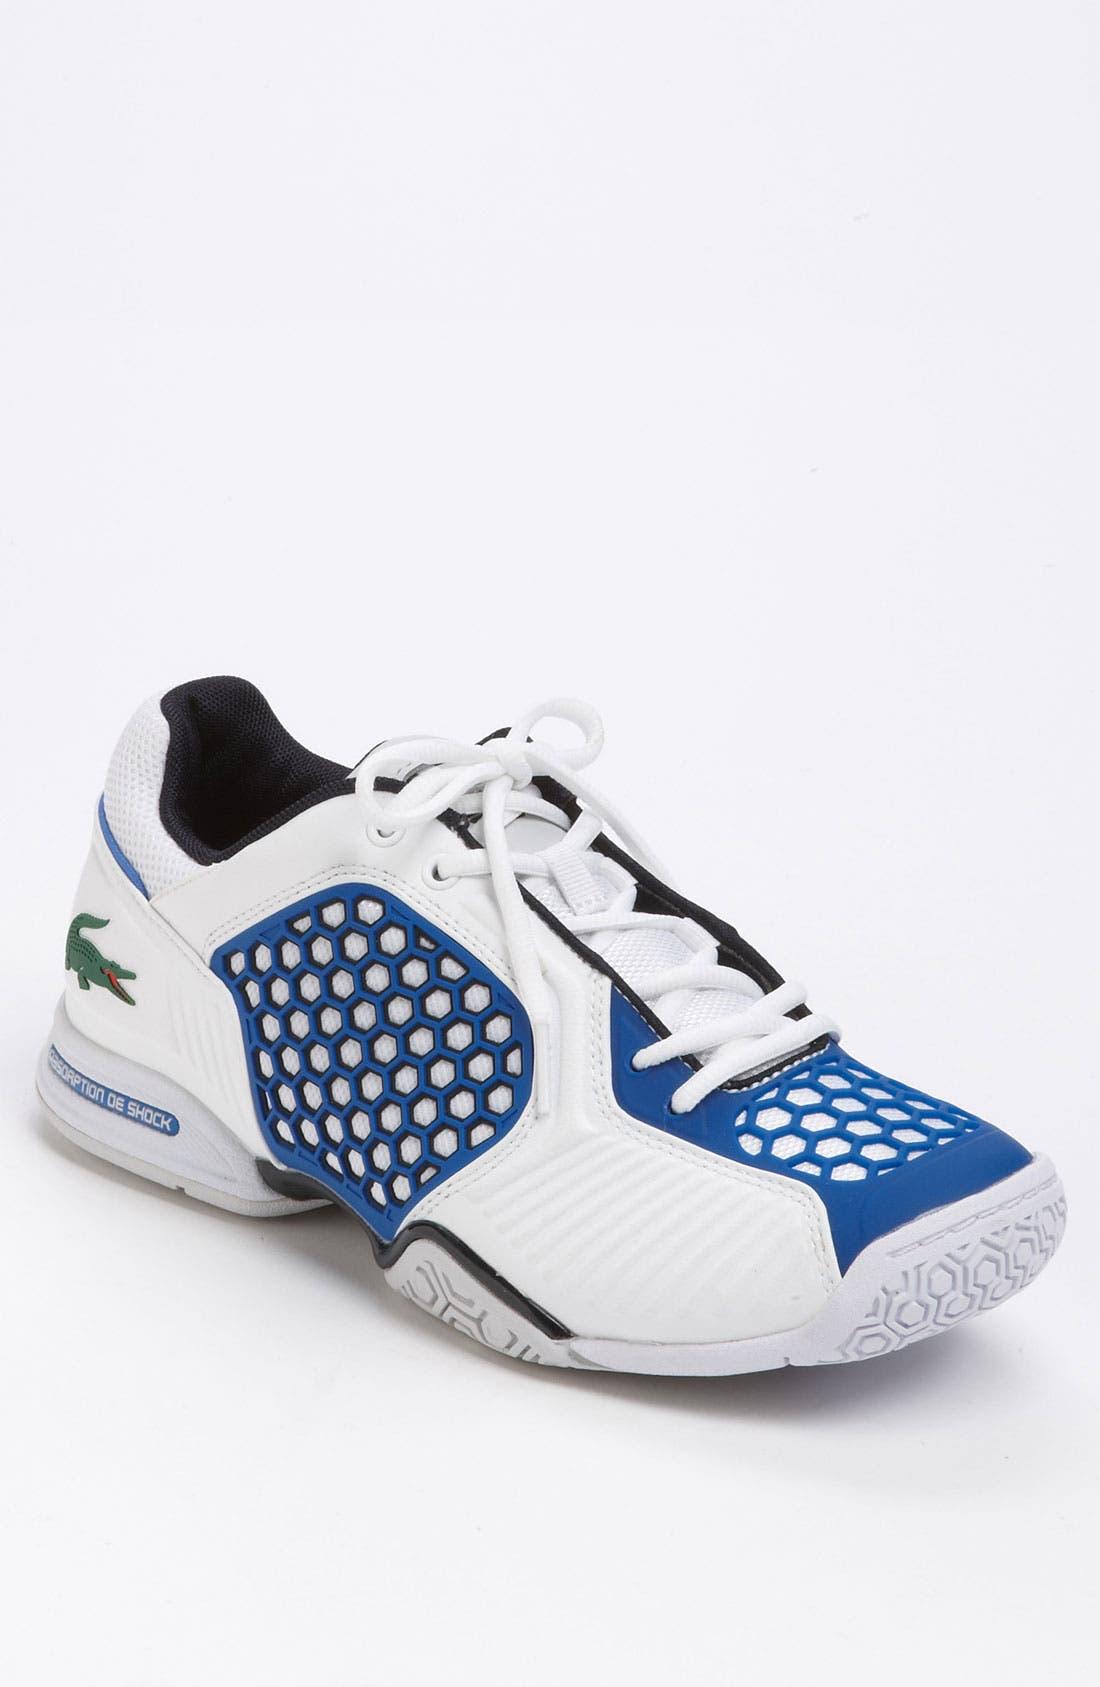 Alternate Image 1 Selected - Lacoste 'Repel 2' Tennis Shoe (Men)